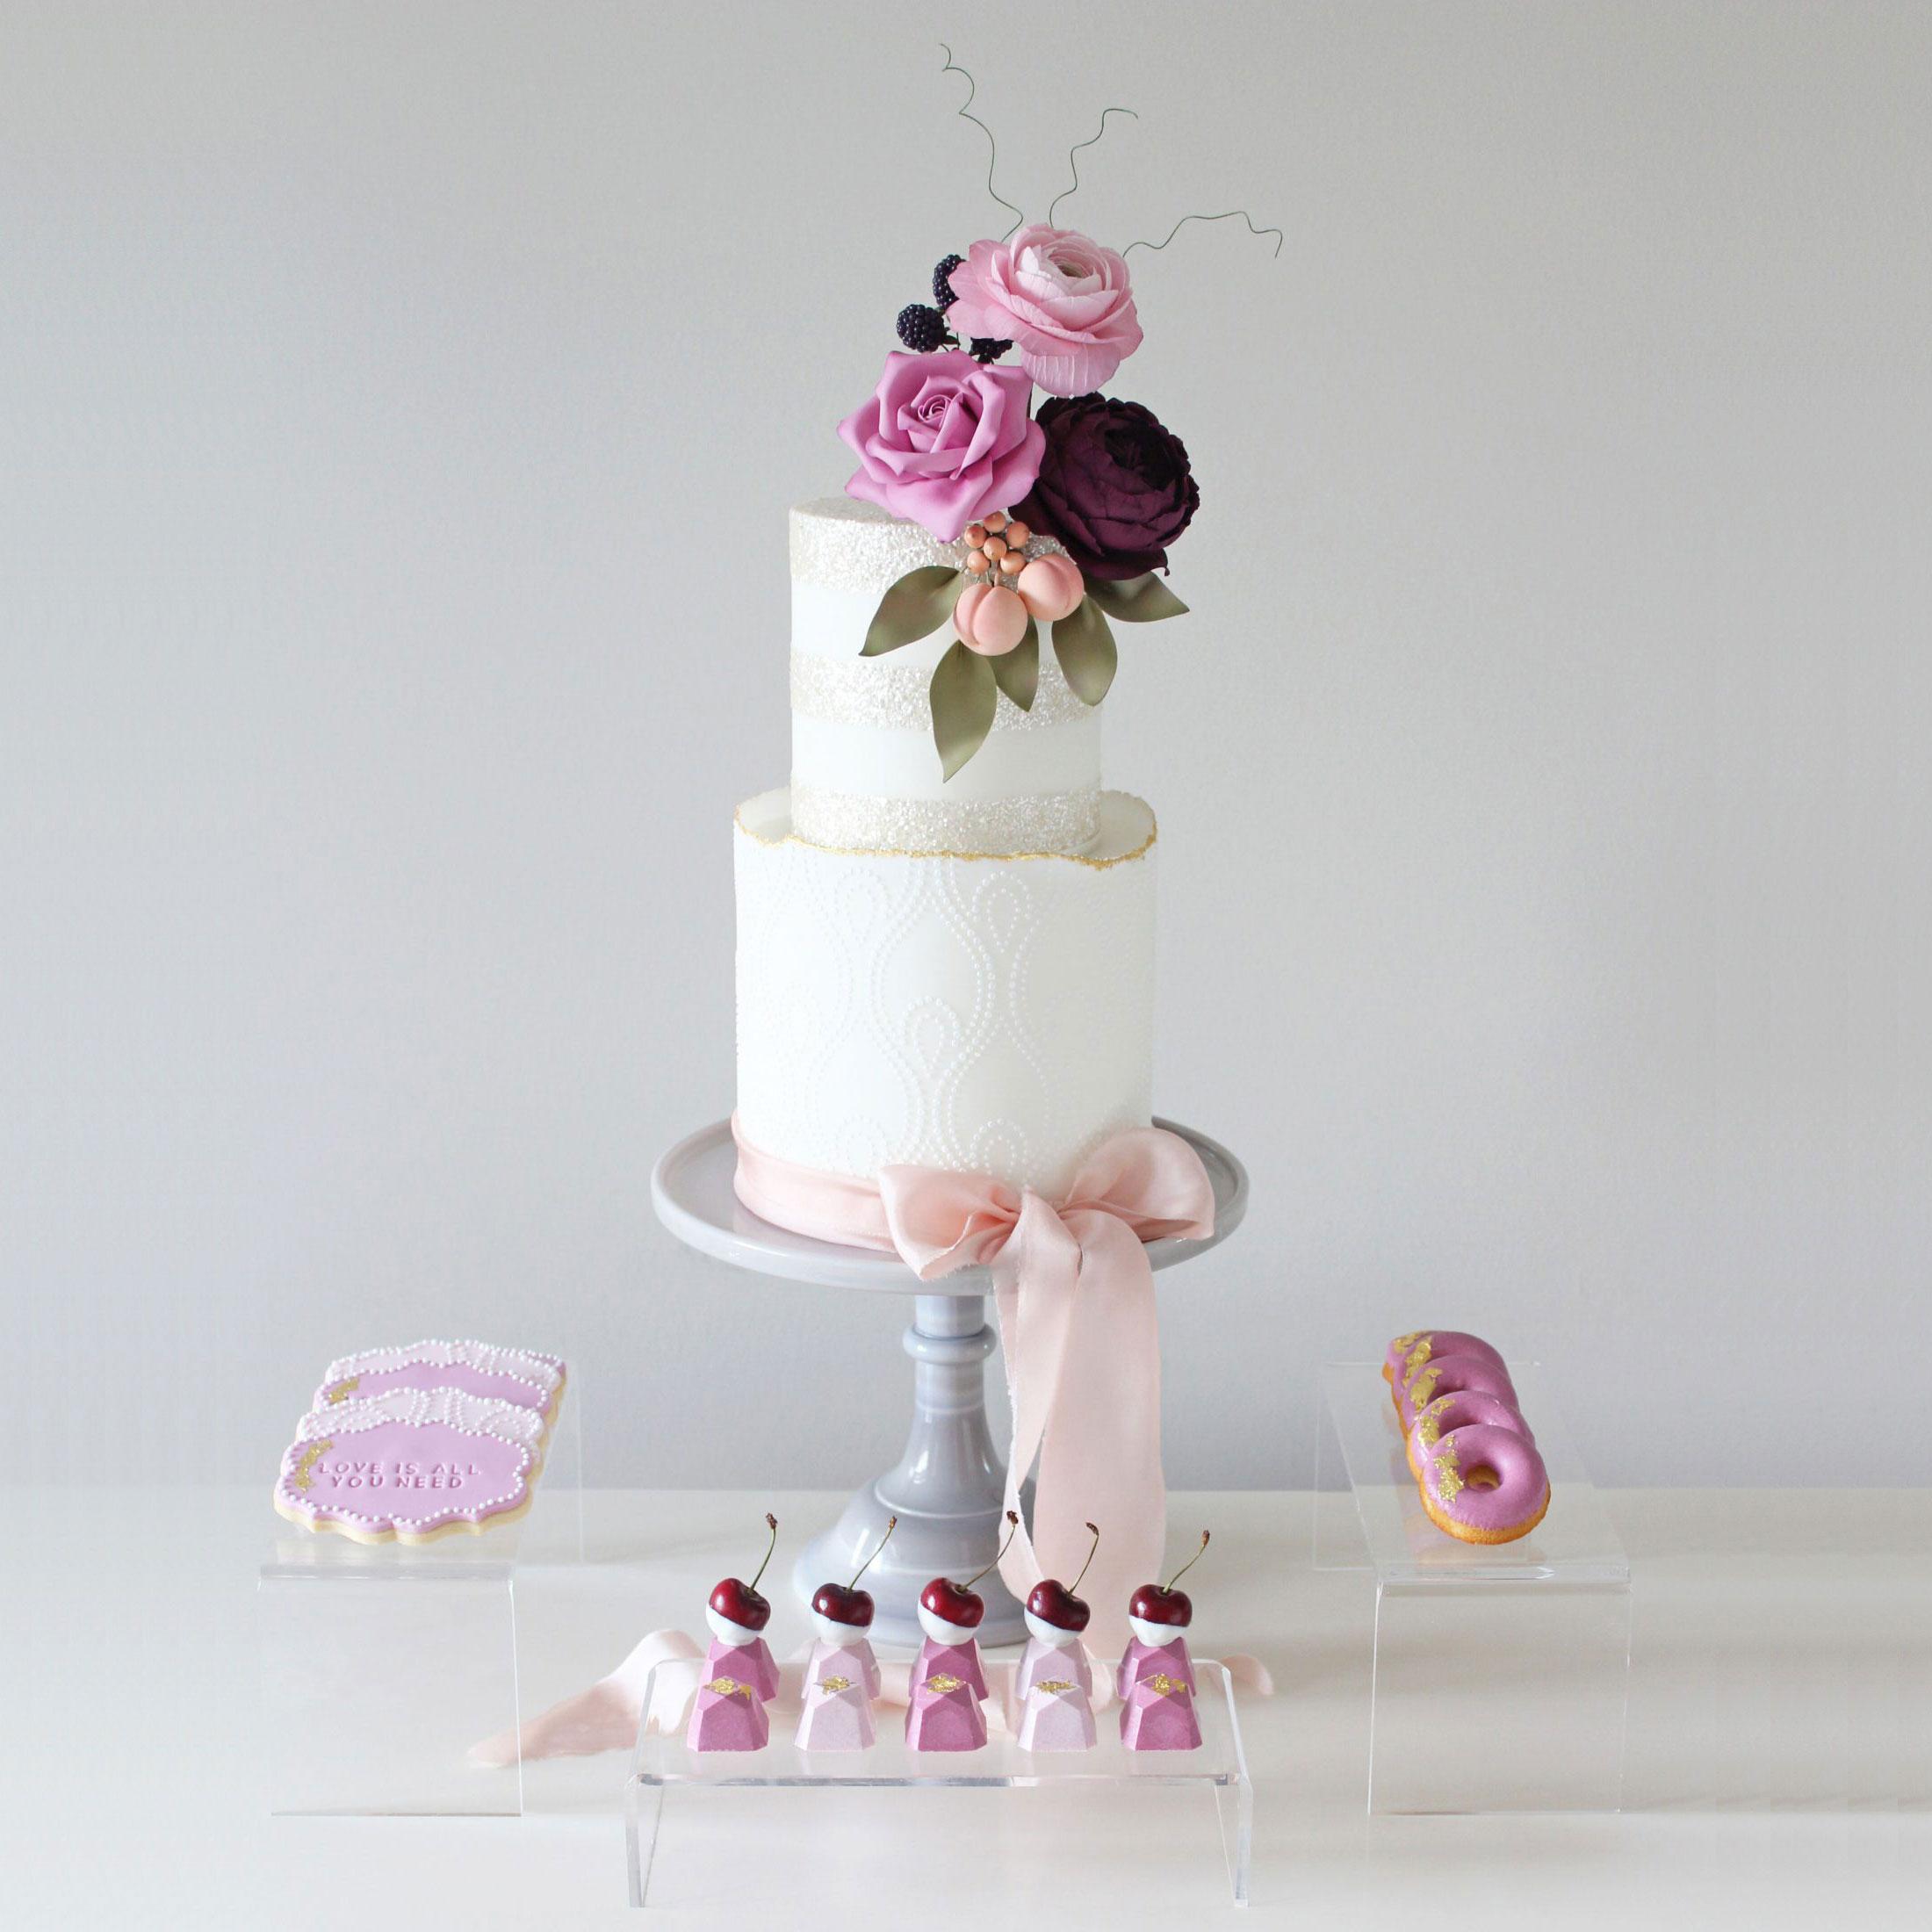 Dessert Table Masterclass – The Designer Cake Company